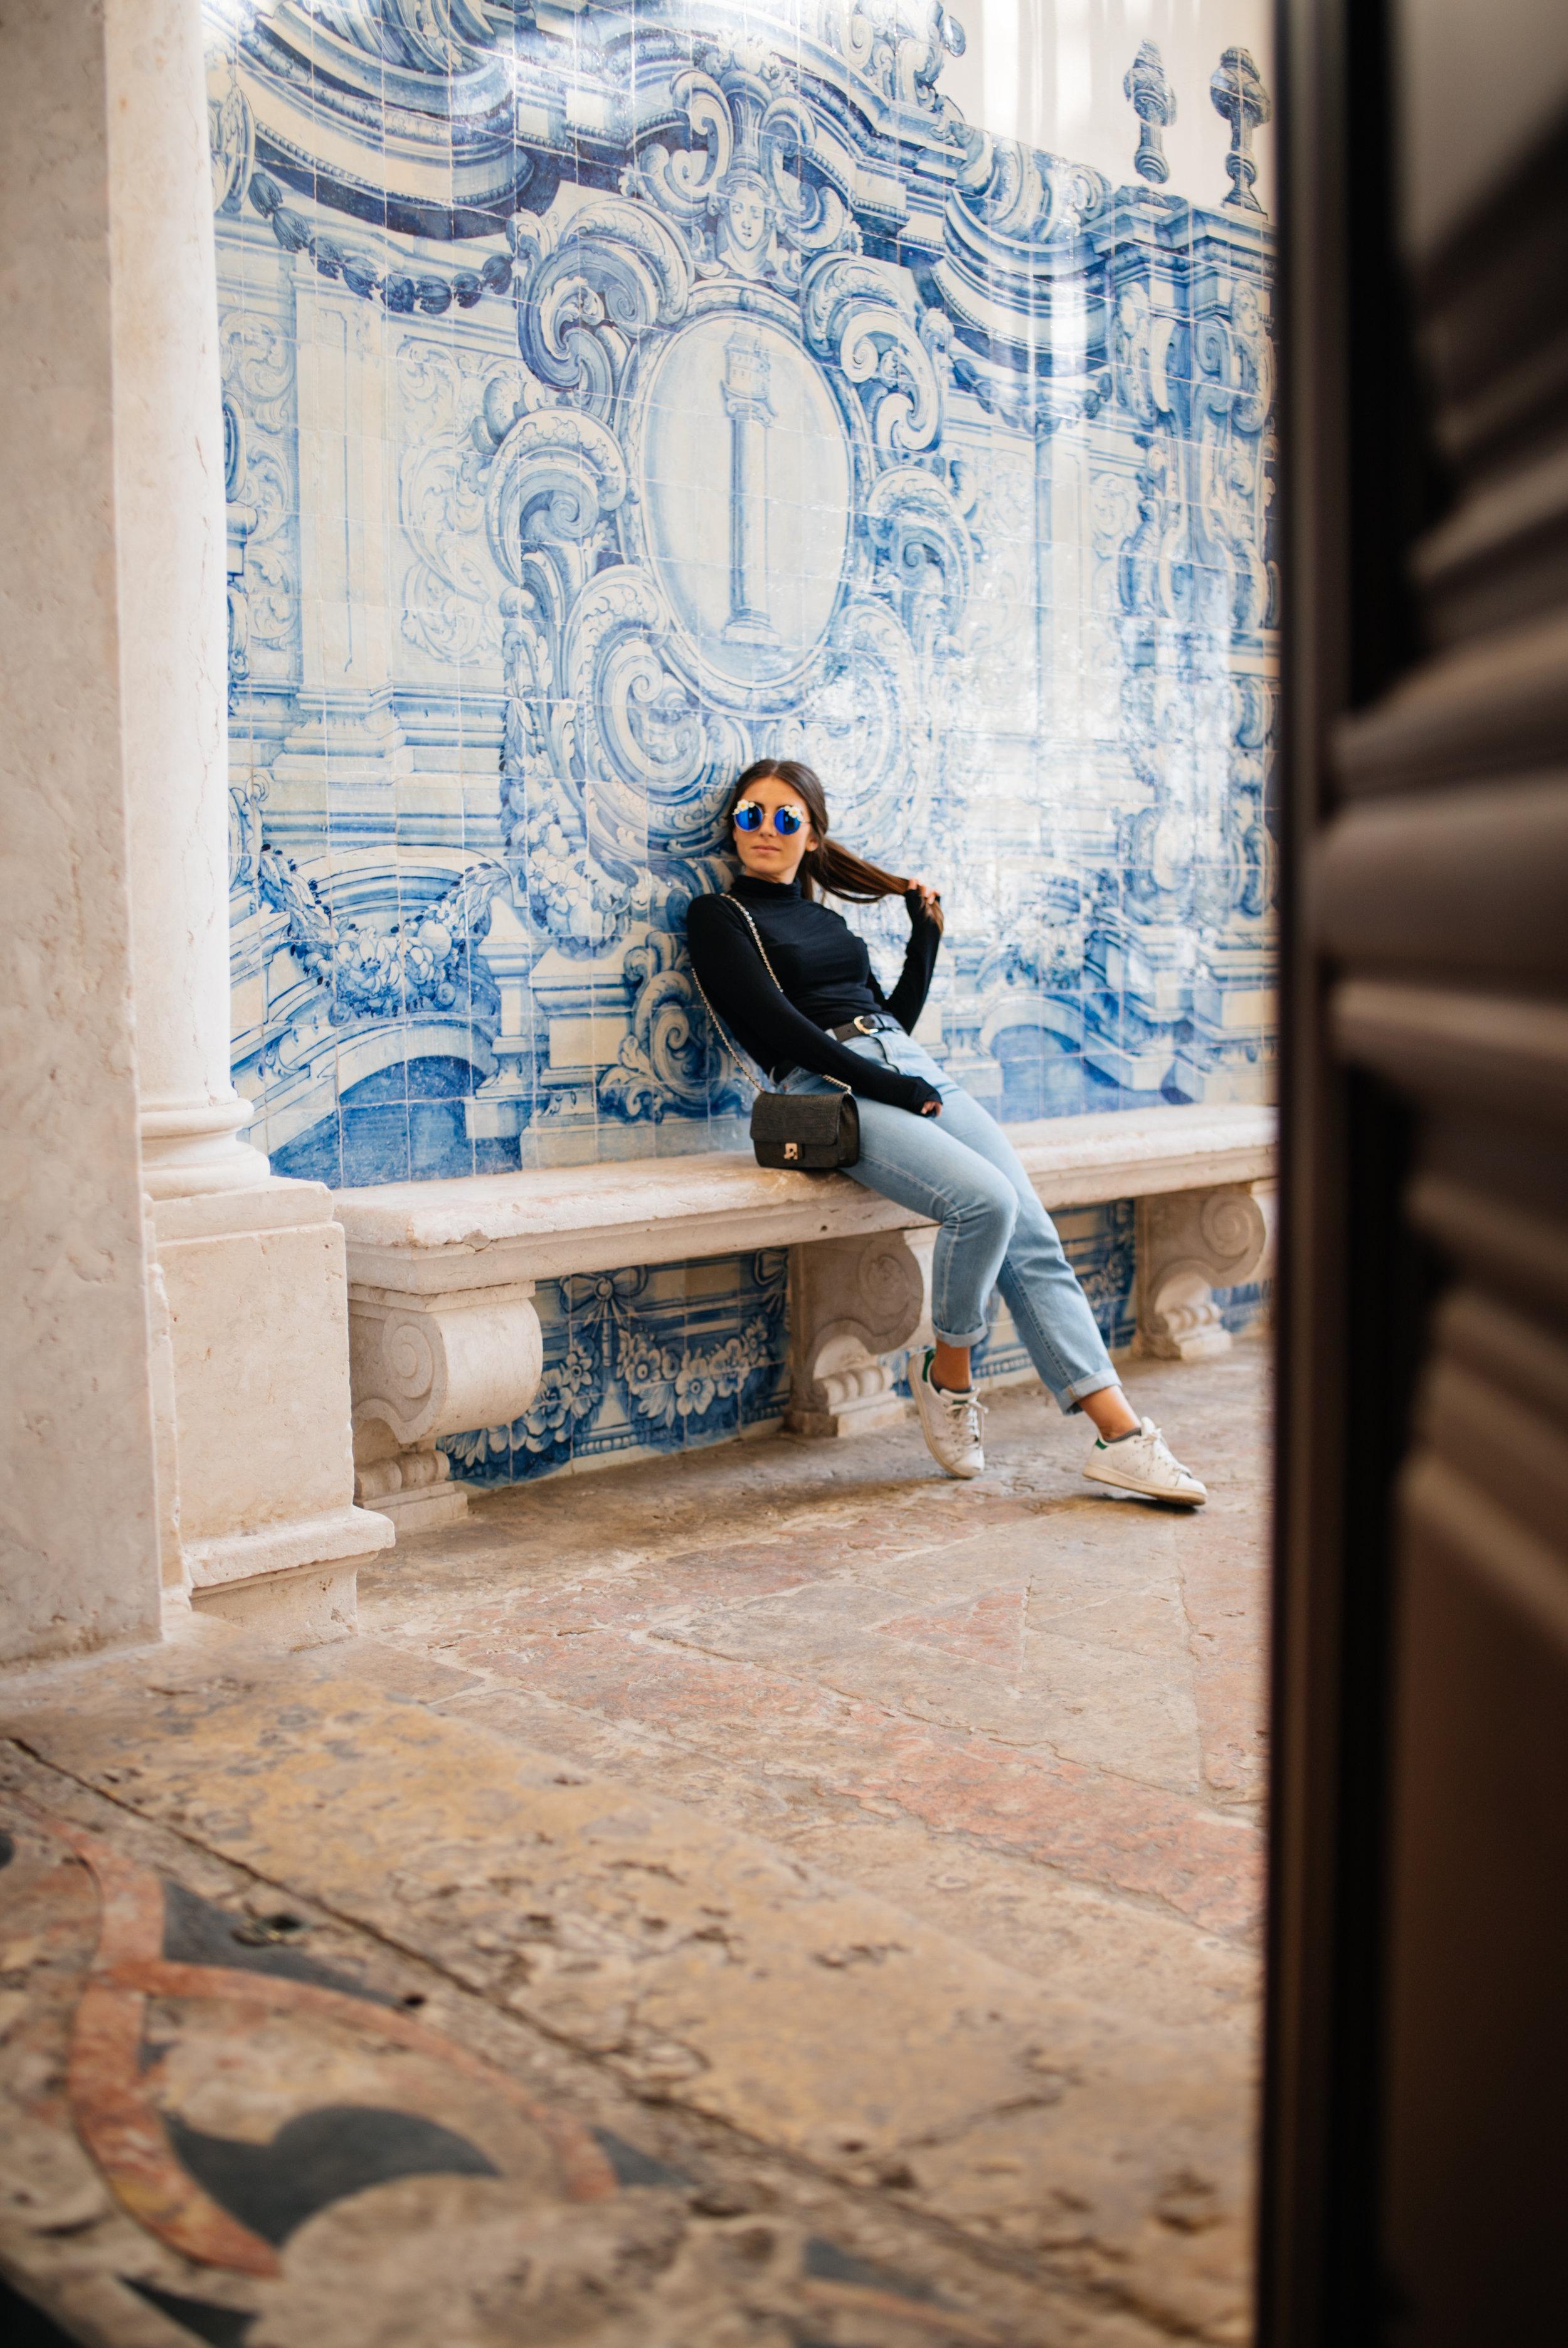 Lisboa-escape-DSTN-Paquerettes-5.jpg